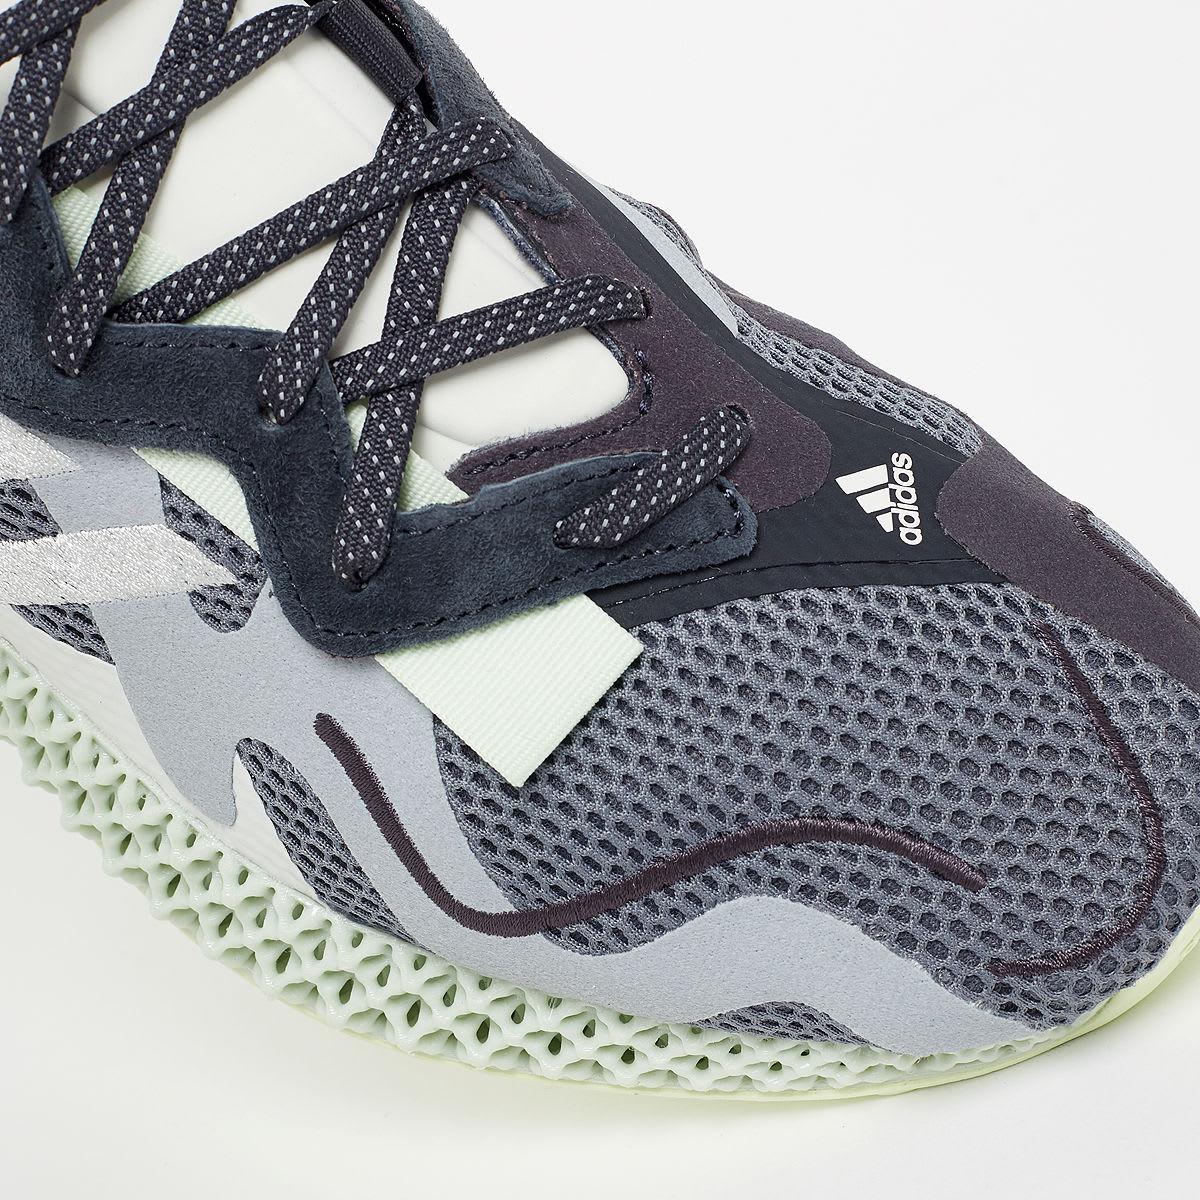 adidas-consortium-4d-runner-v2-toe-eg6510